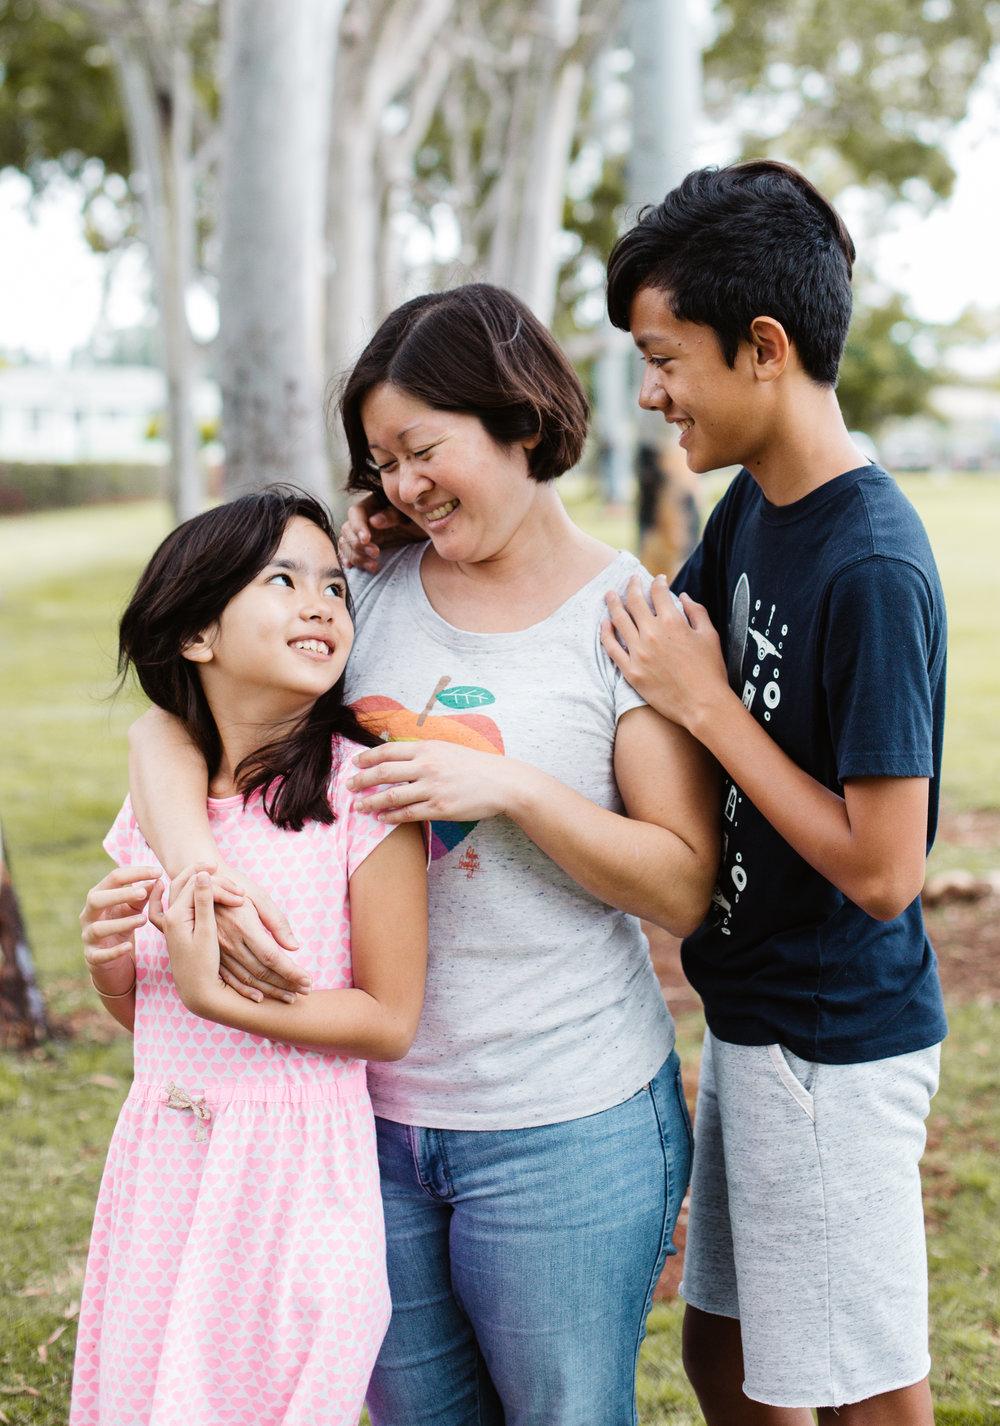 joy-uyeno-sudbury-family-photographer-travel-hawaii-6.jpg